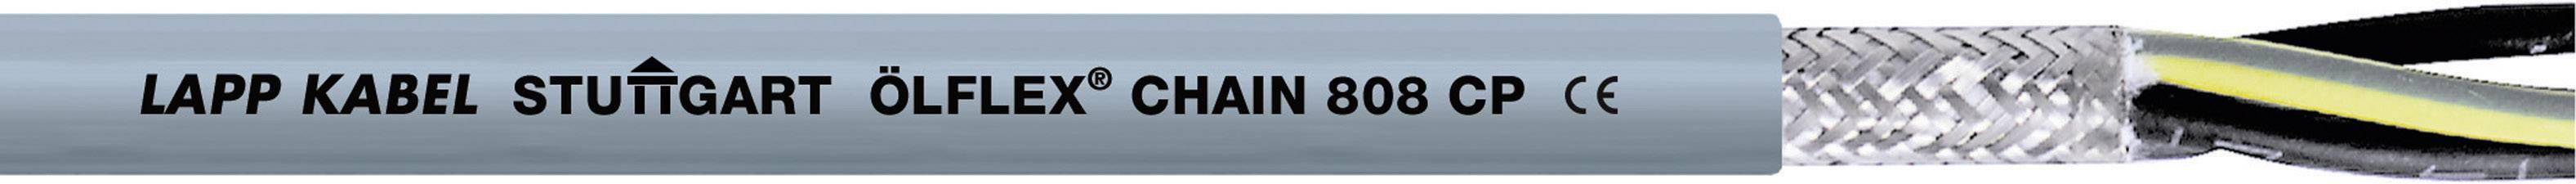 Žíla kabelu LappKabel ÖLFLEX CHAIN 808 CP 2X1,0 (1027767), 2x 1 mm², polyurethan, Ø 6,5 mm, stíněný, 50 m, šed